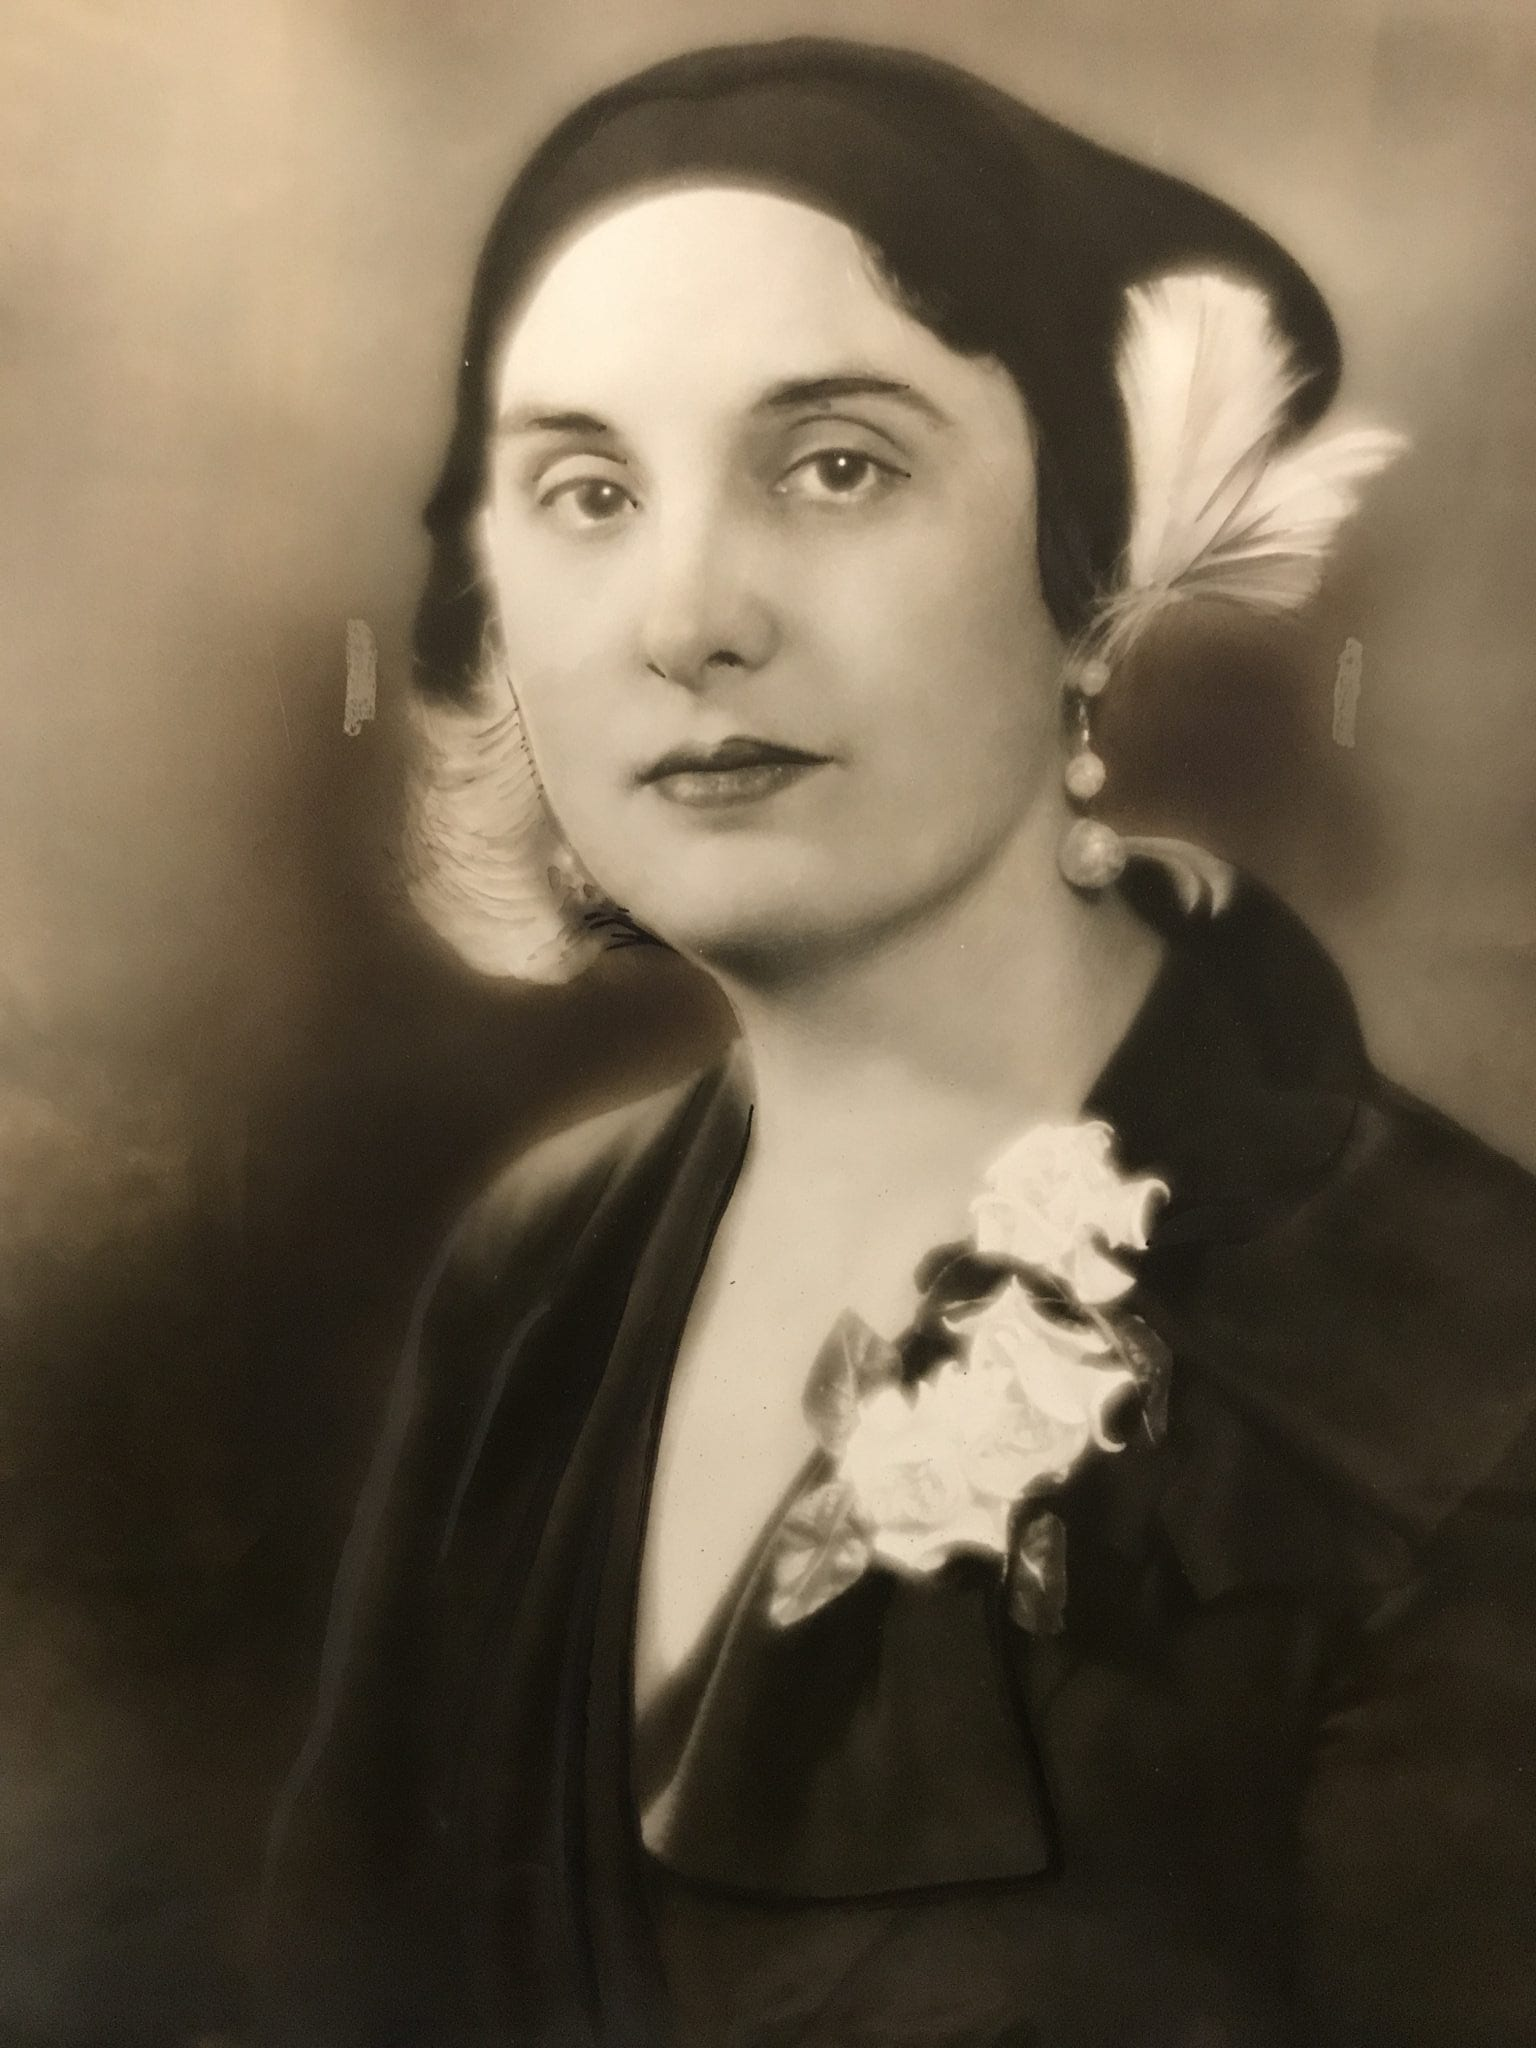 Maude Bouldin